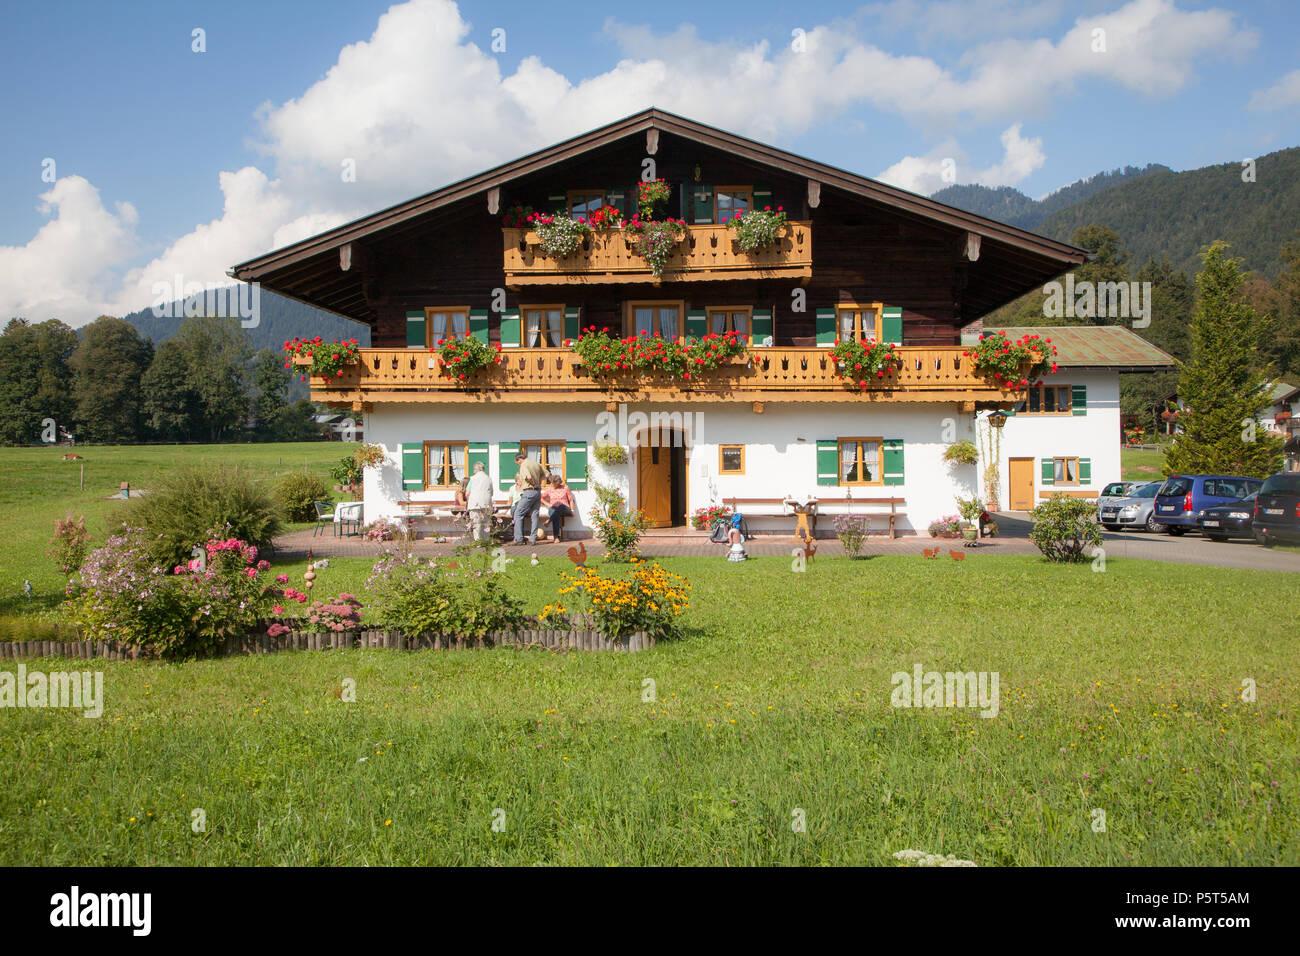 Traditioneller Bauernhof im Berchtesgadener Land - Stock Image